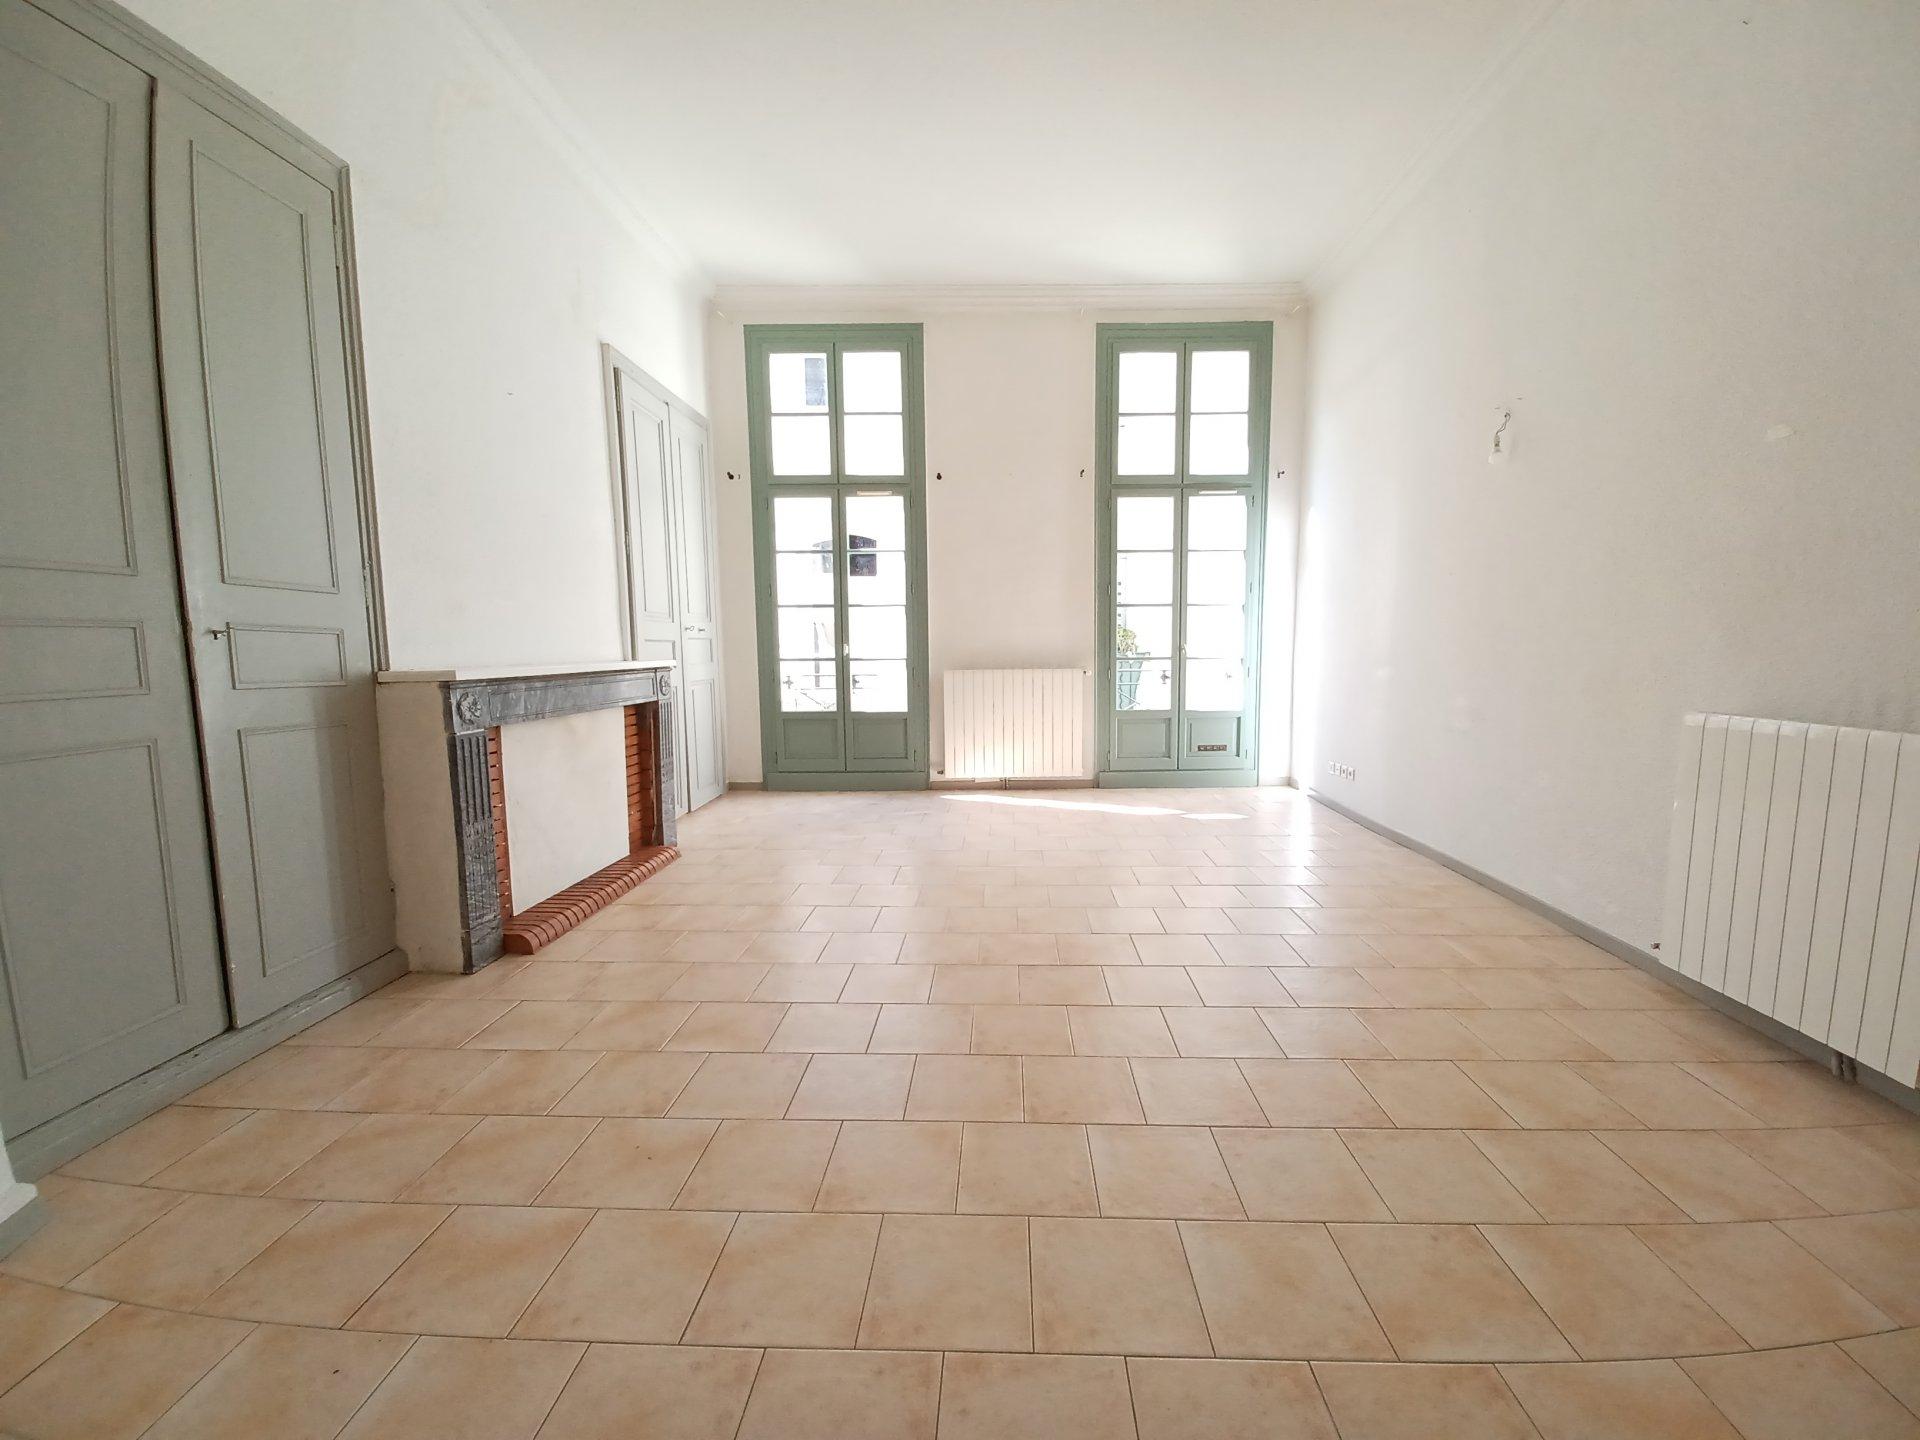 Location Appartement BEAUCAIRE Mandat : 0716